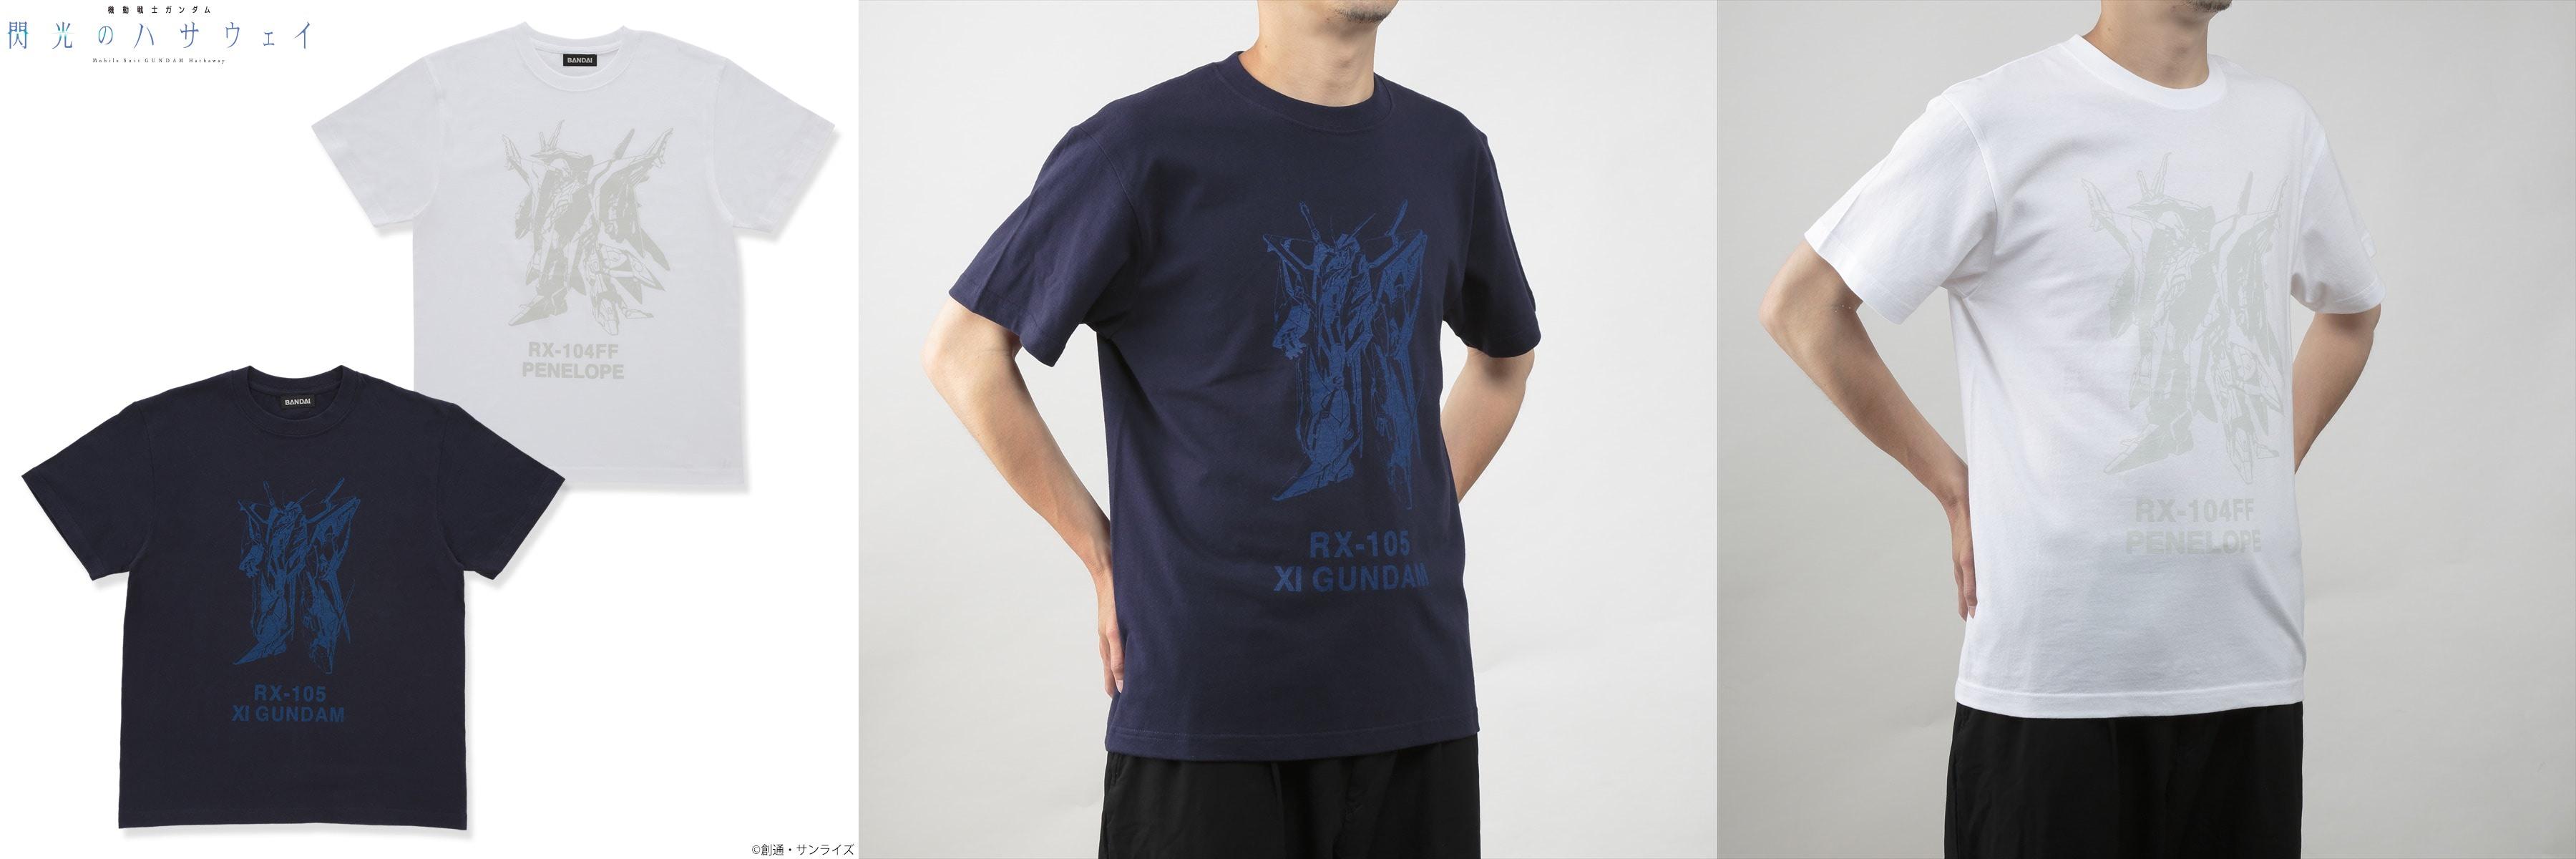 BLUEシリーズ/WHITEシリーズ Tシャツ